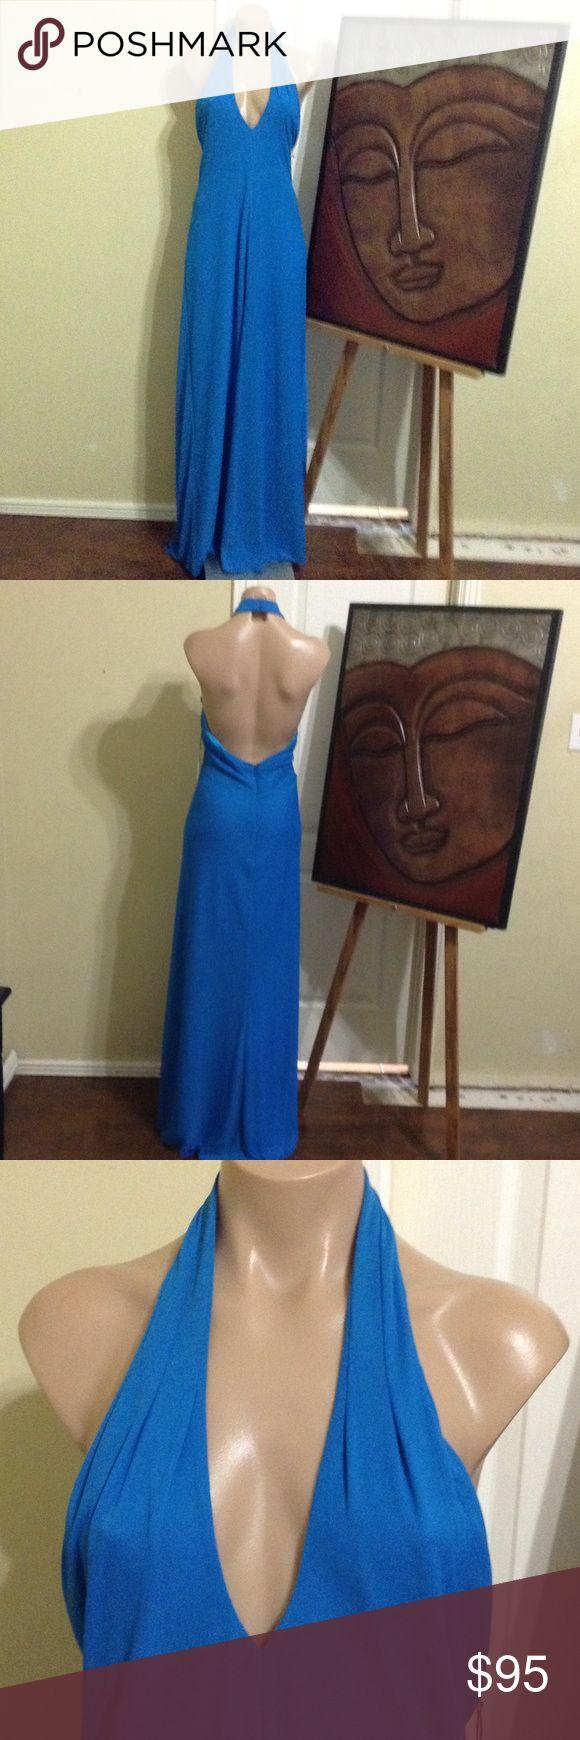 Kay unger New York aqua long dress nwt $395.00 Kay unger New York Aqua long dress, size 10, polyester, nwt $395.00,halter,length 55-59 Kay Unger Dresses